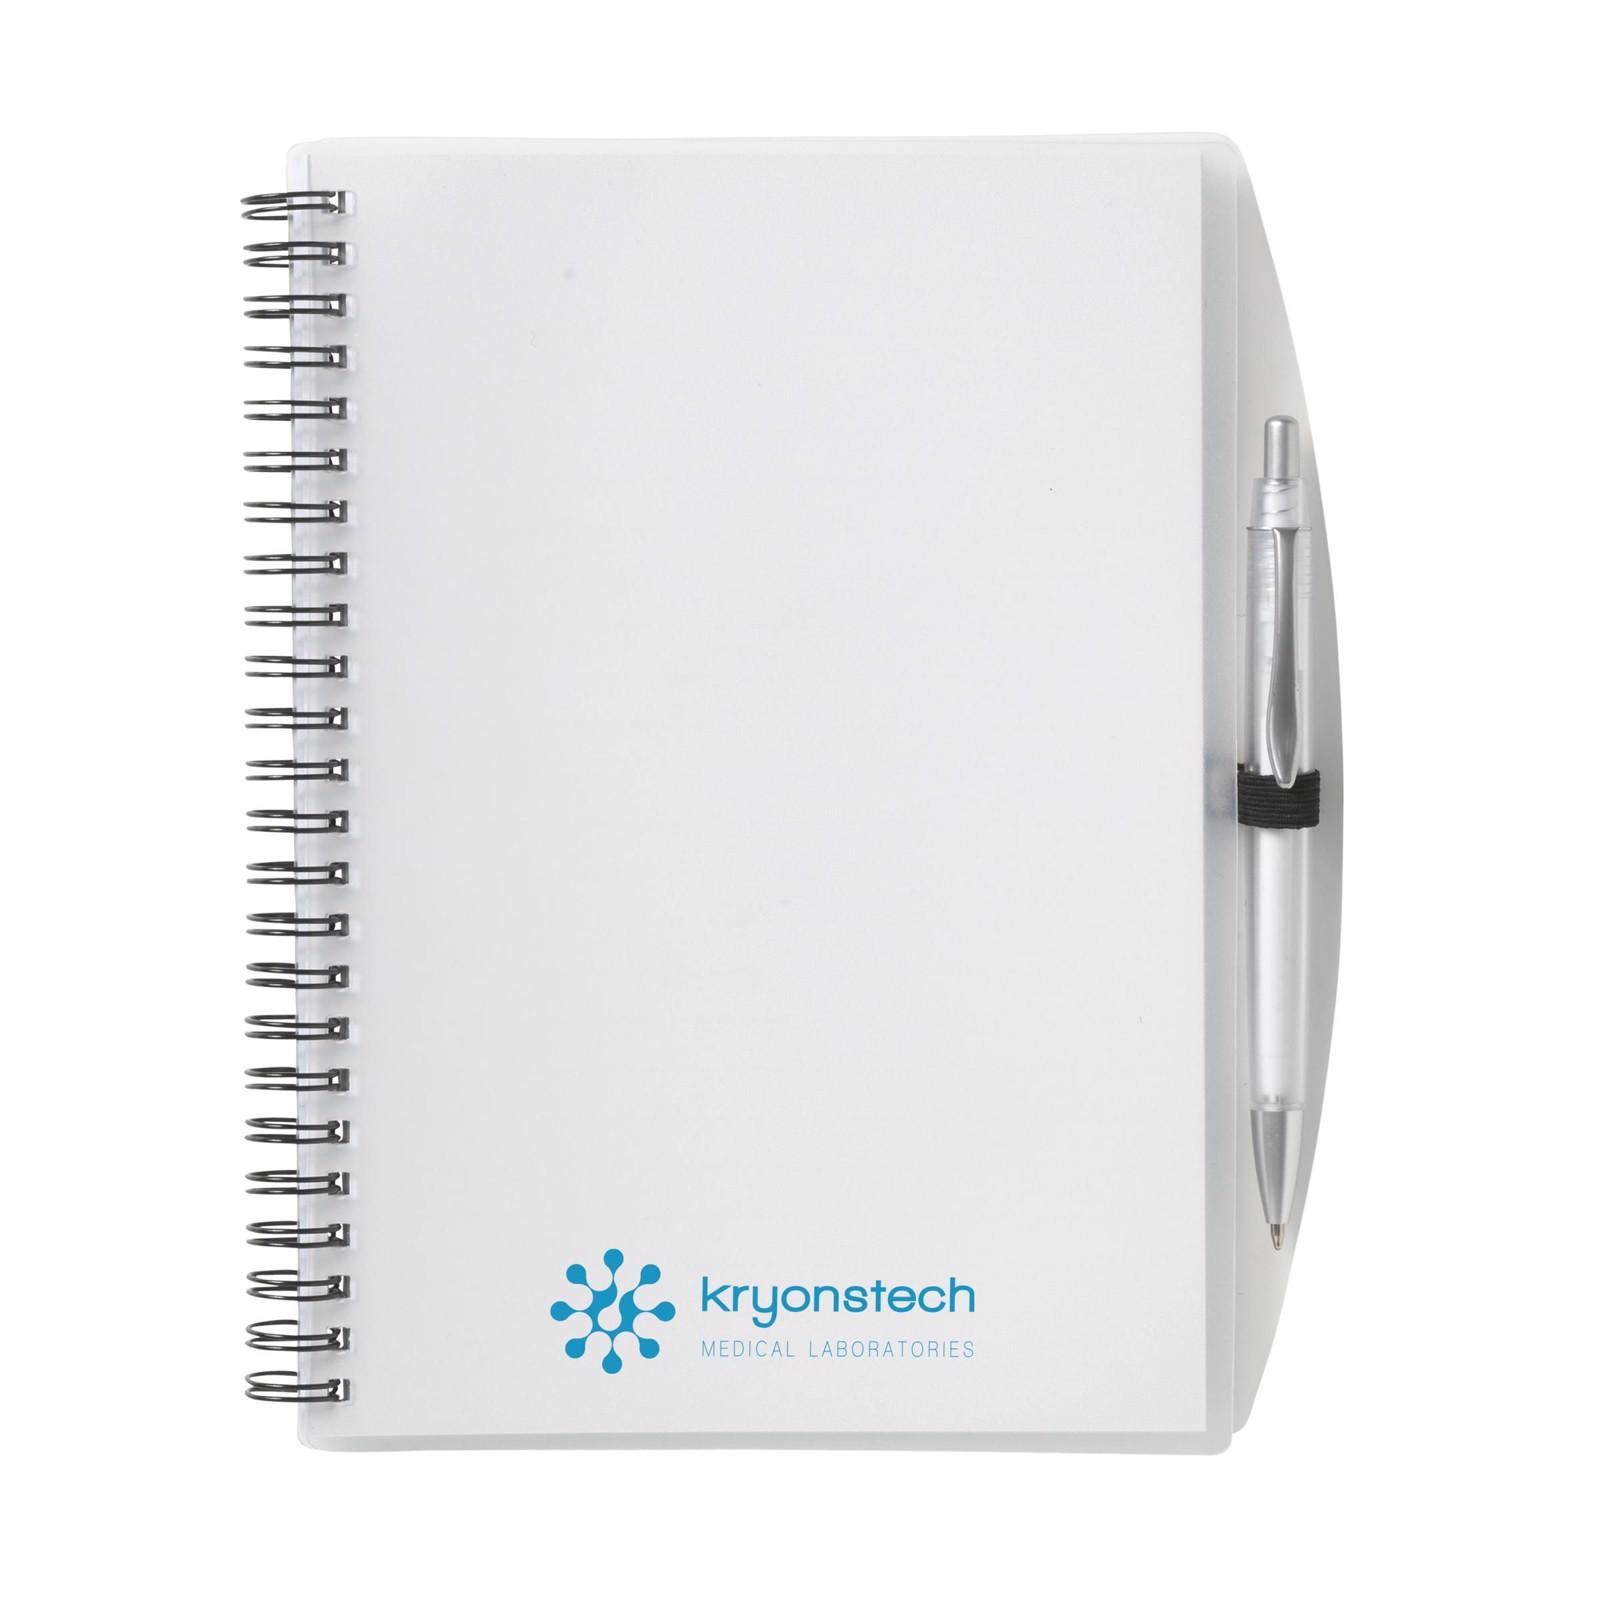 NoteBook A5 notebook - Transparent White